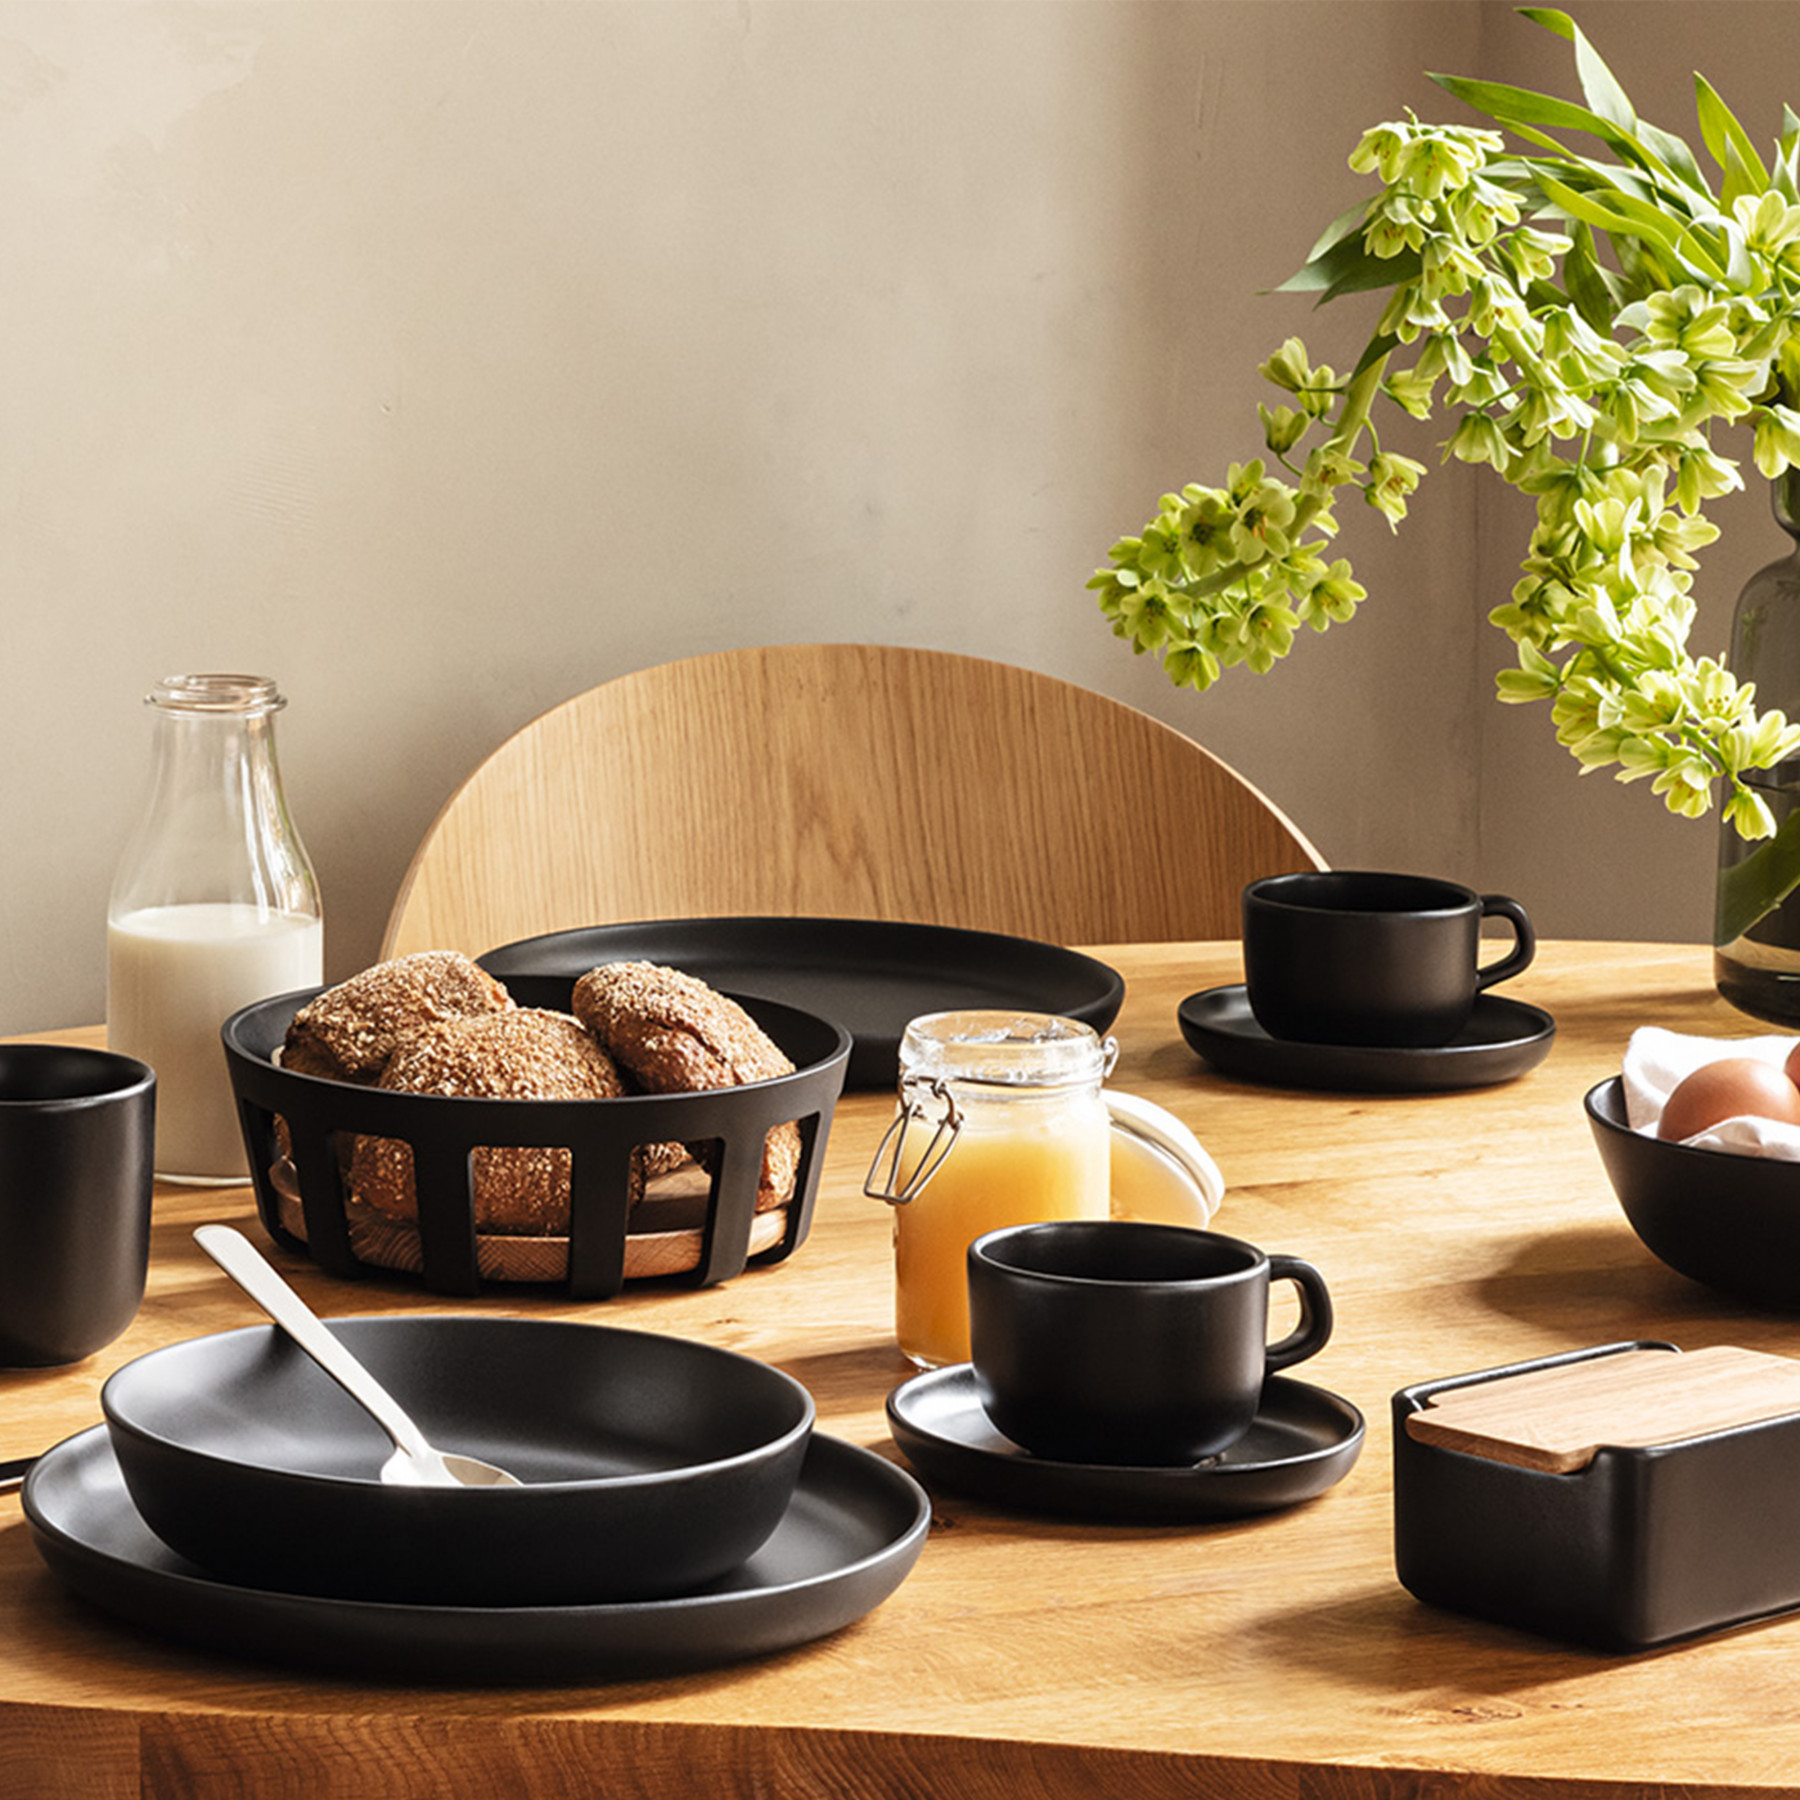 Eva Solo Nordic Kitchen Brotkorb, 520437, 57066331209526